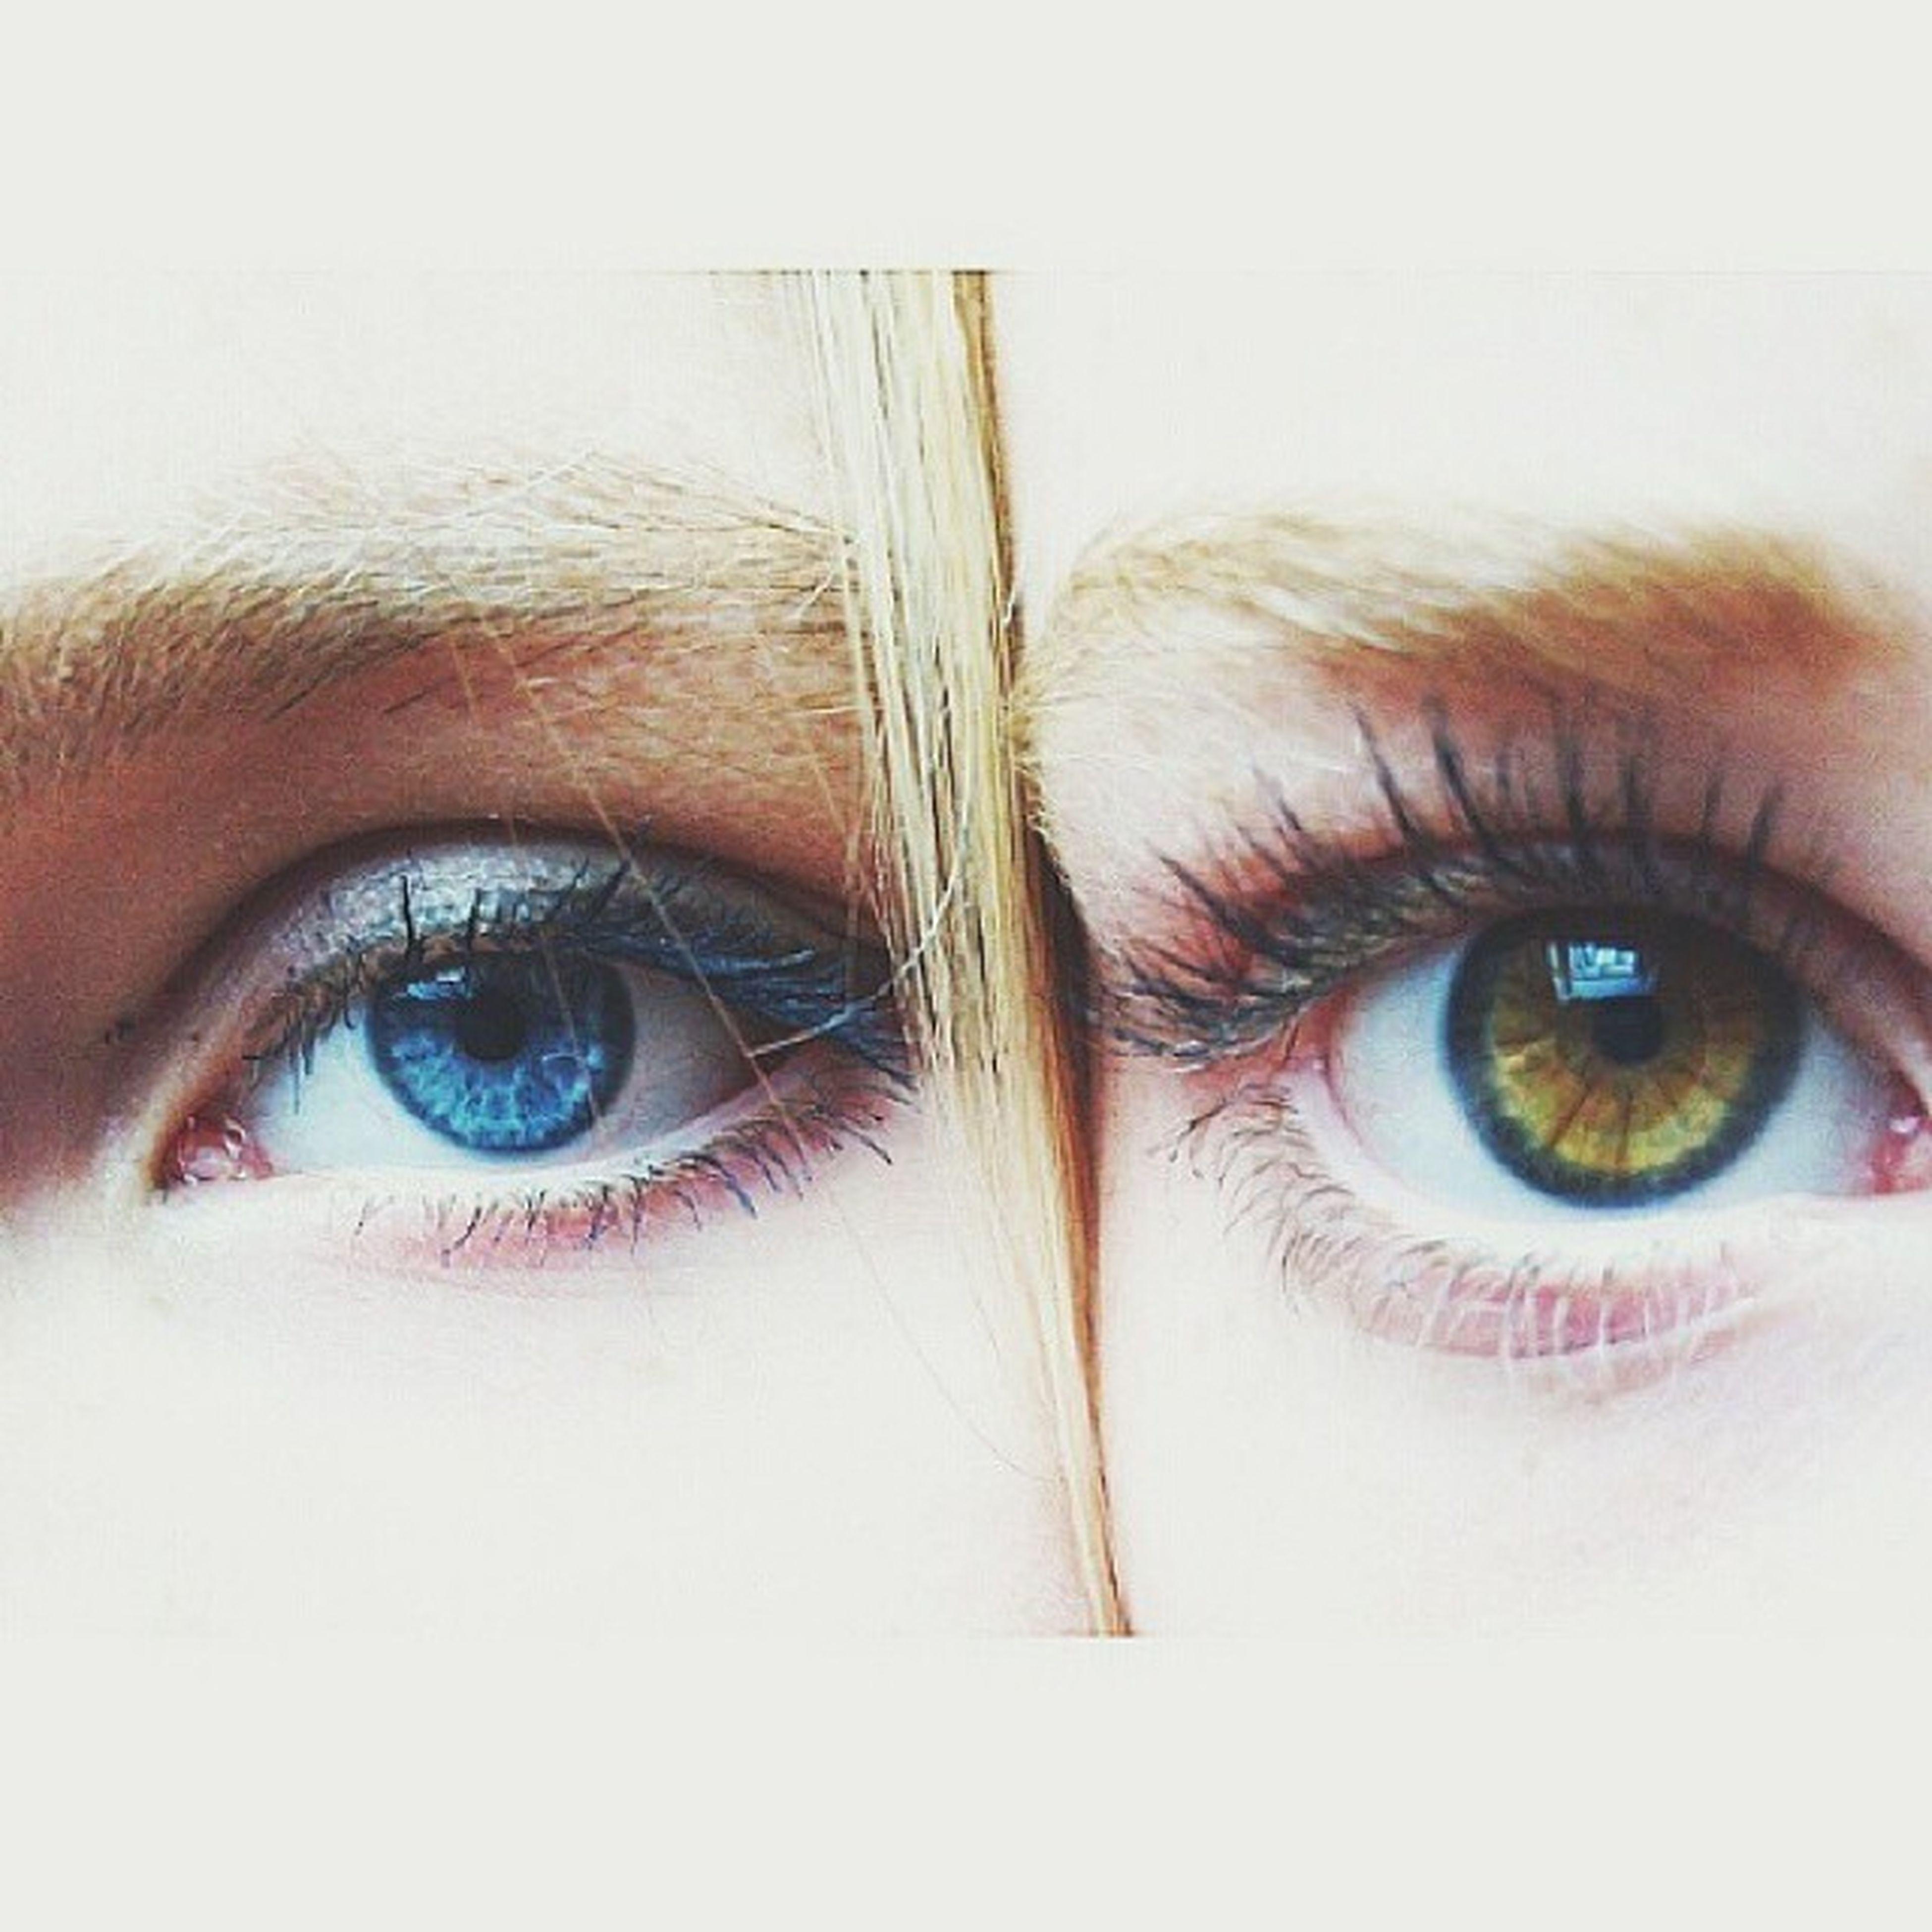 human eye, looking at camera, portrait, close-up, eyelash, headshot, human face, eyesight, lifestyles, indoors, part of, sensory perception, eyebrow, person, young adult, front view, blue eyes